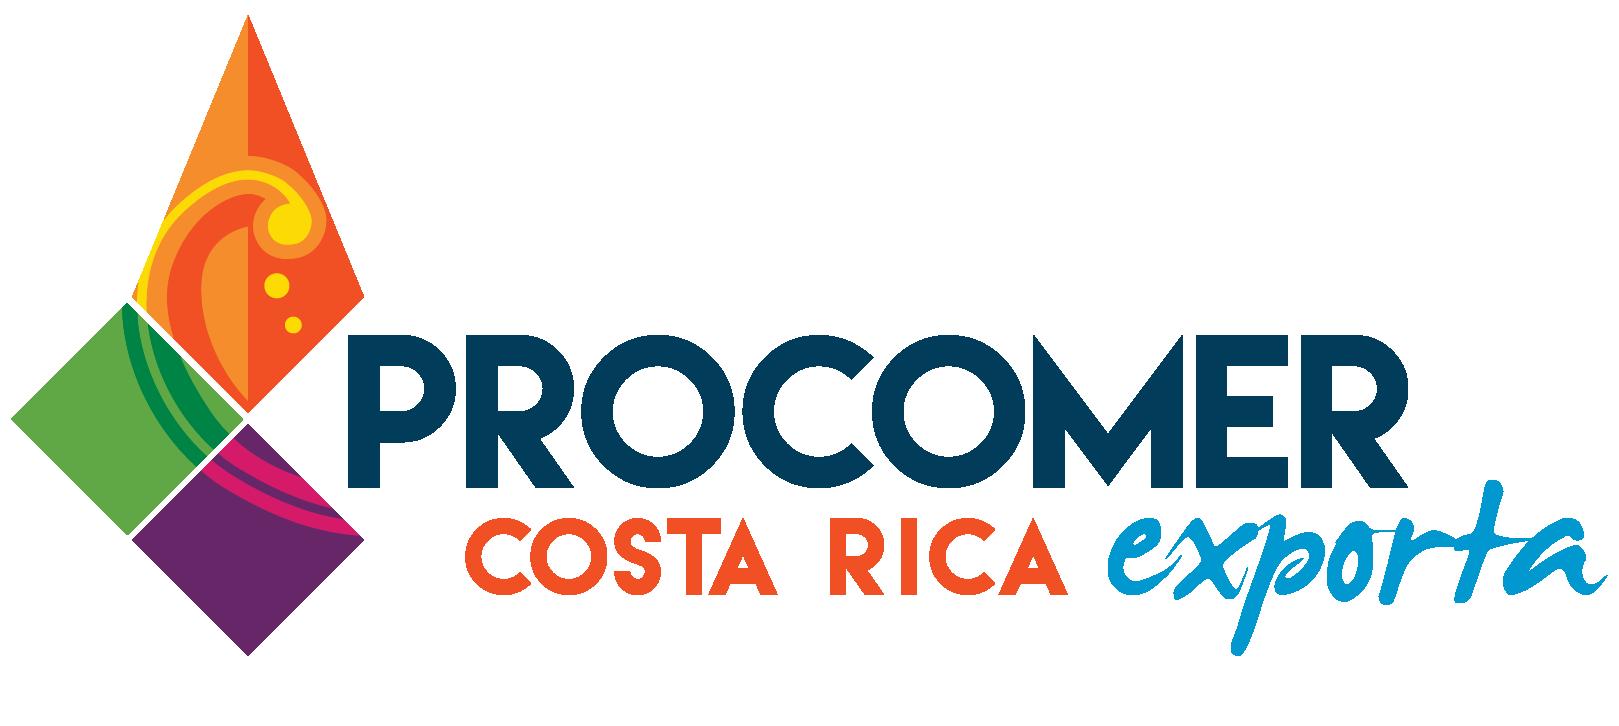 Procomer logo 01